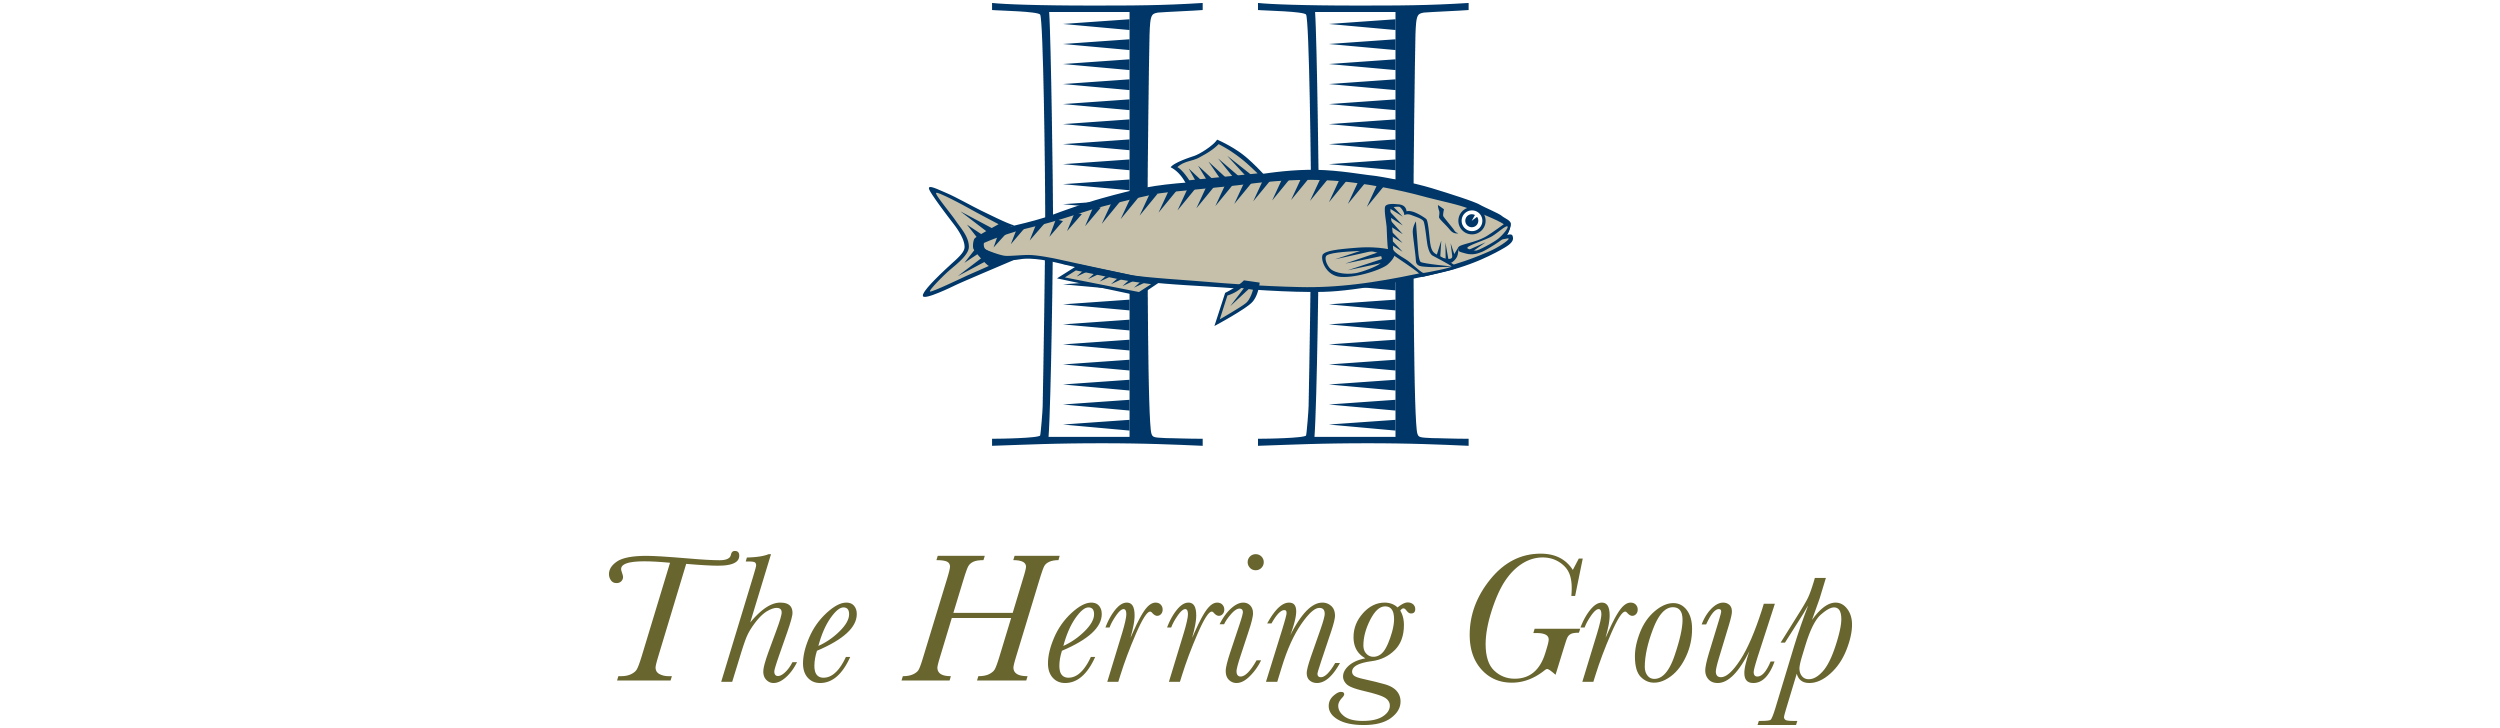 the-herring-group